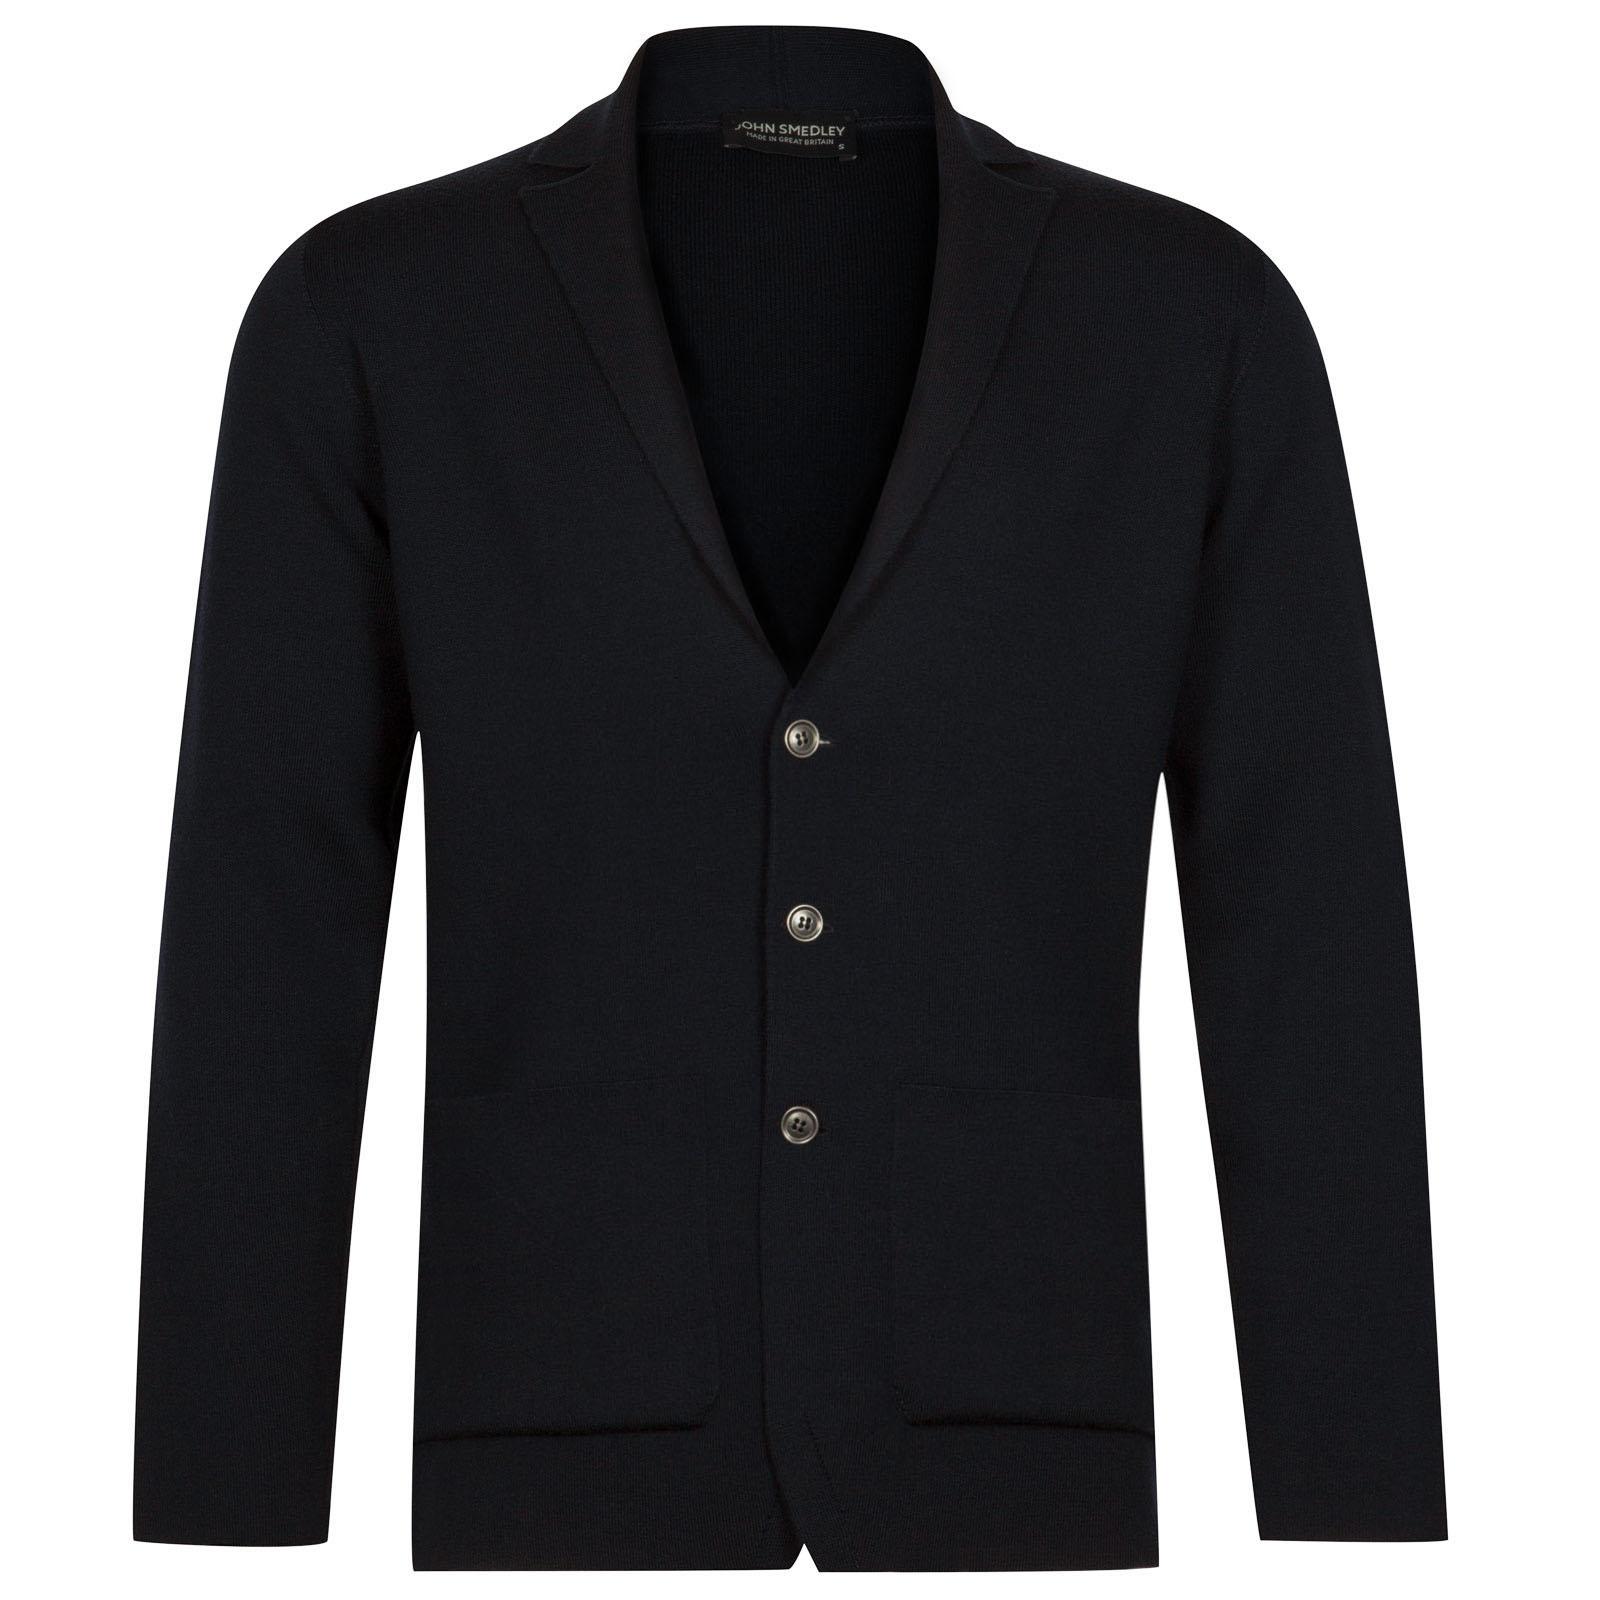 John Smedley Oxland Merino Wool Jacket in Midnight-XL